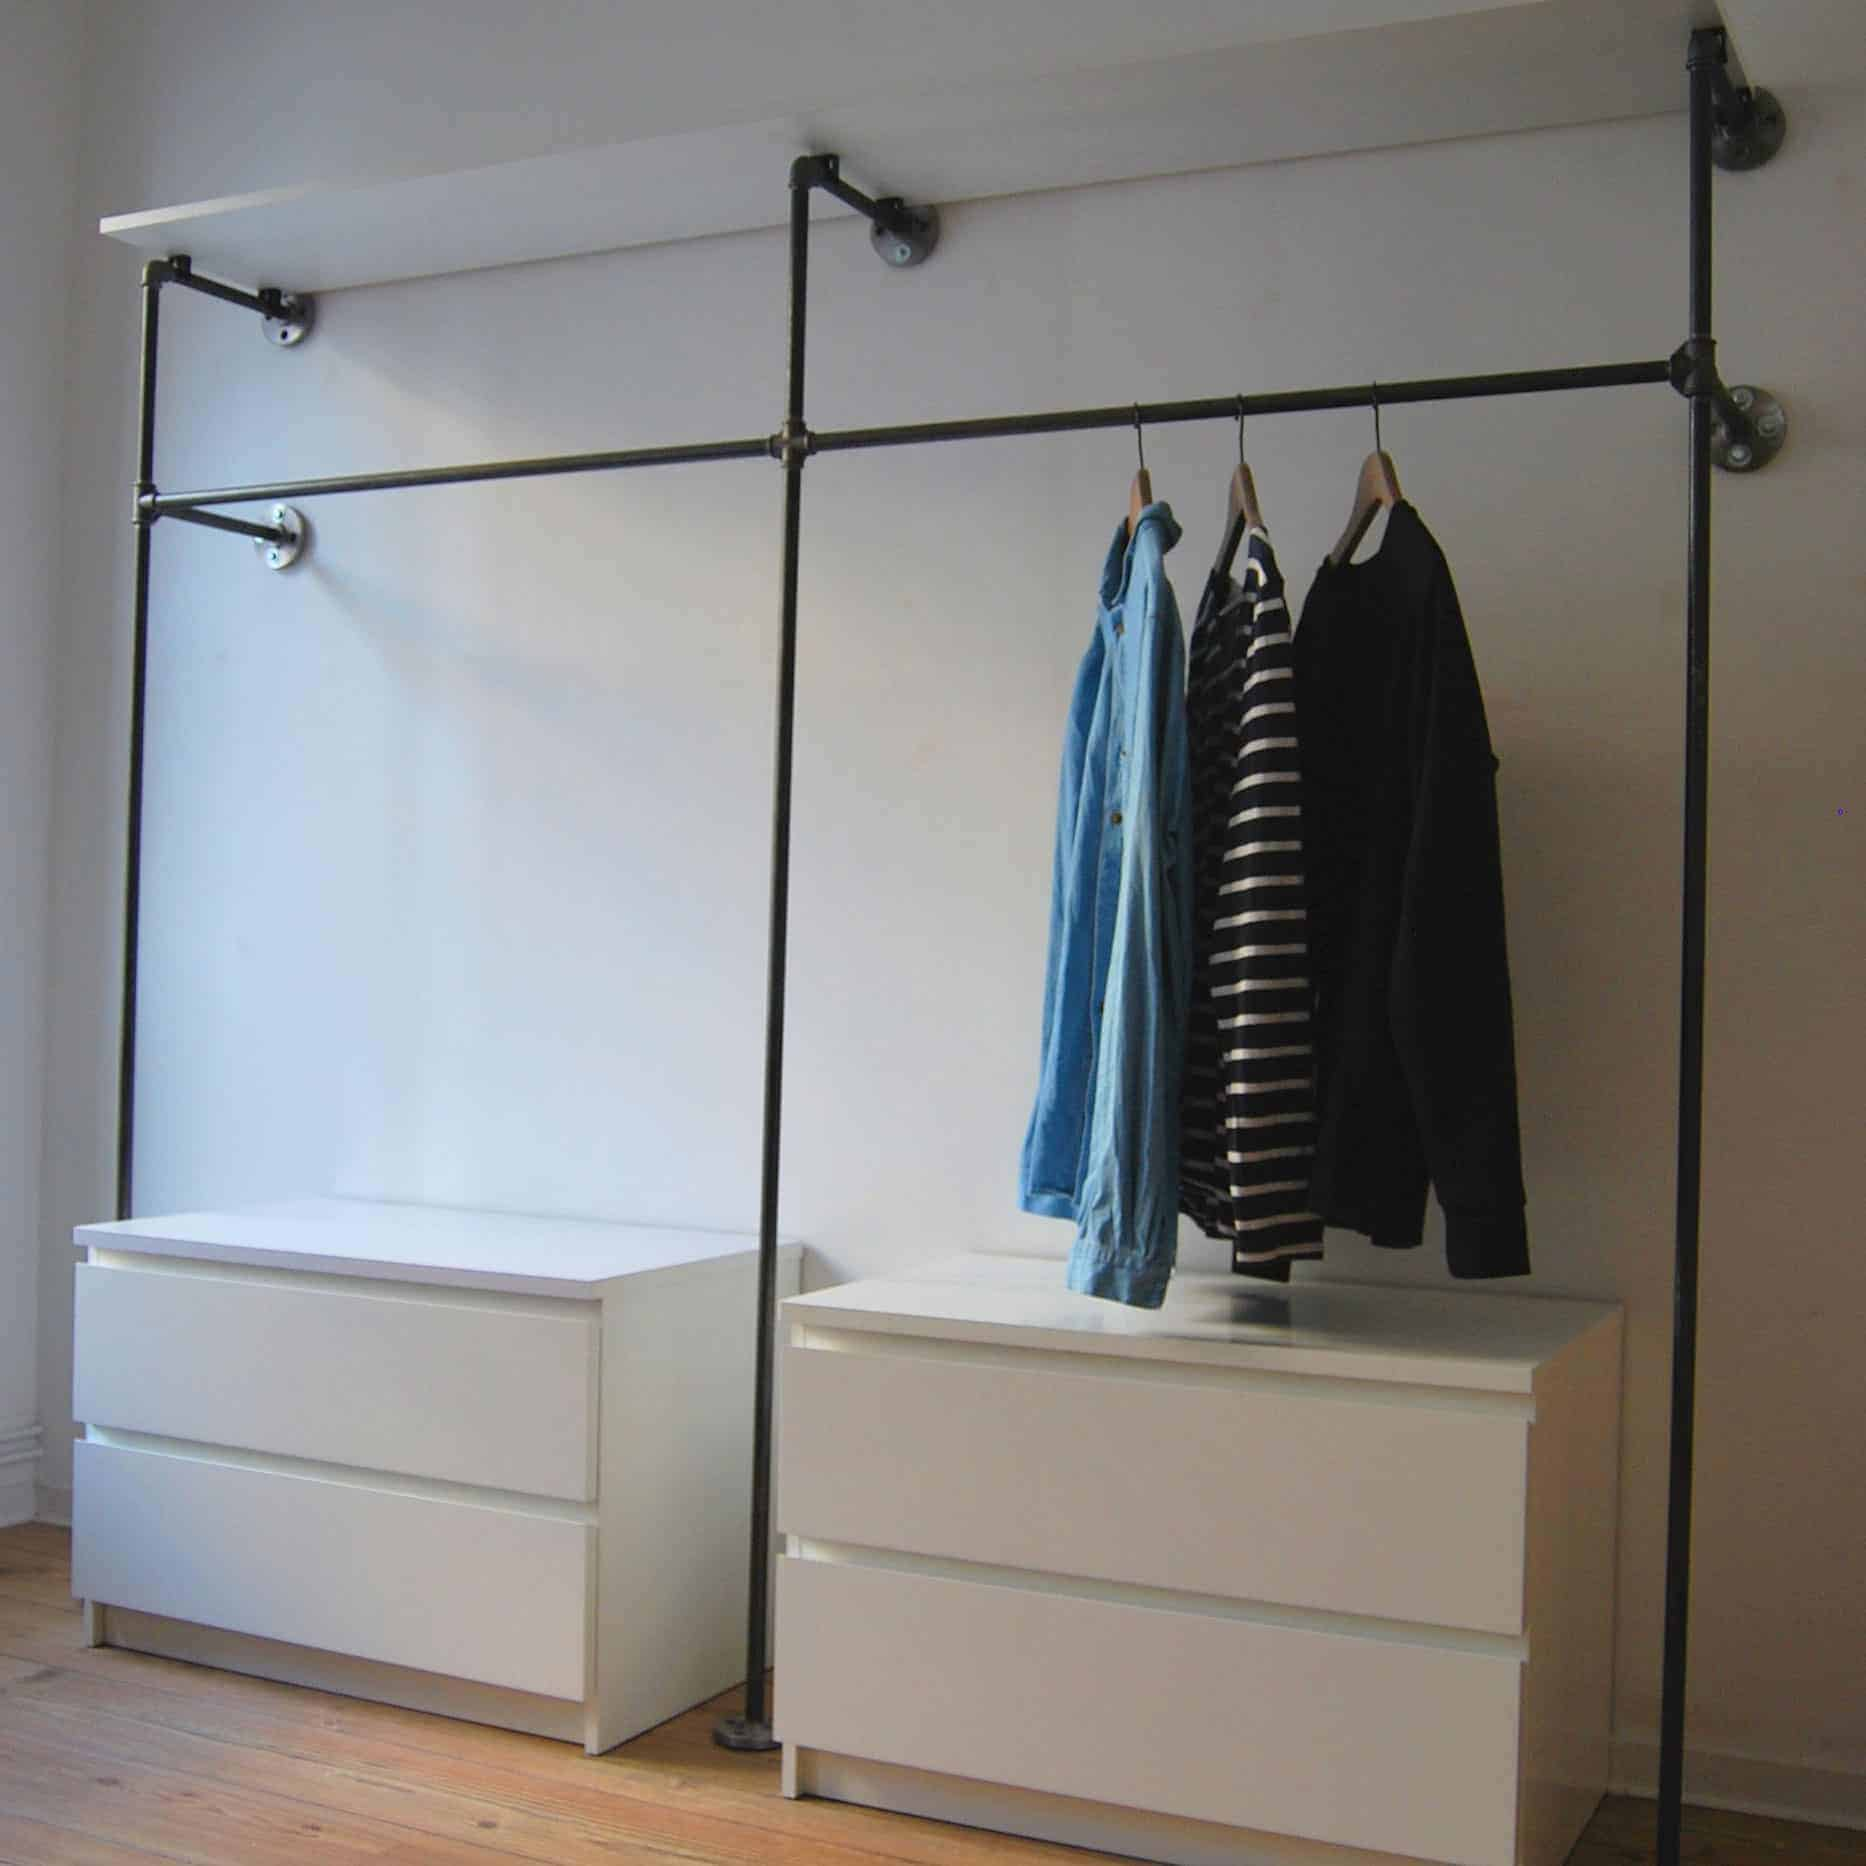 offener industrial design kleiderschrank offene garderobe duo high various. Black Bedroom Furniture Sets. Home Design Ideas